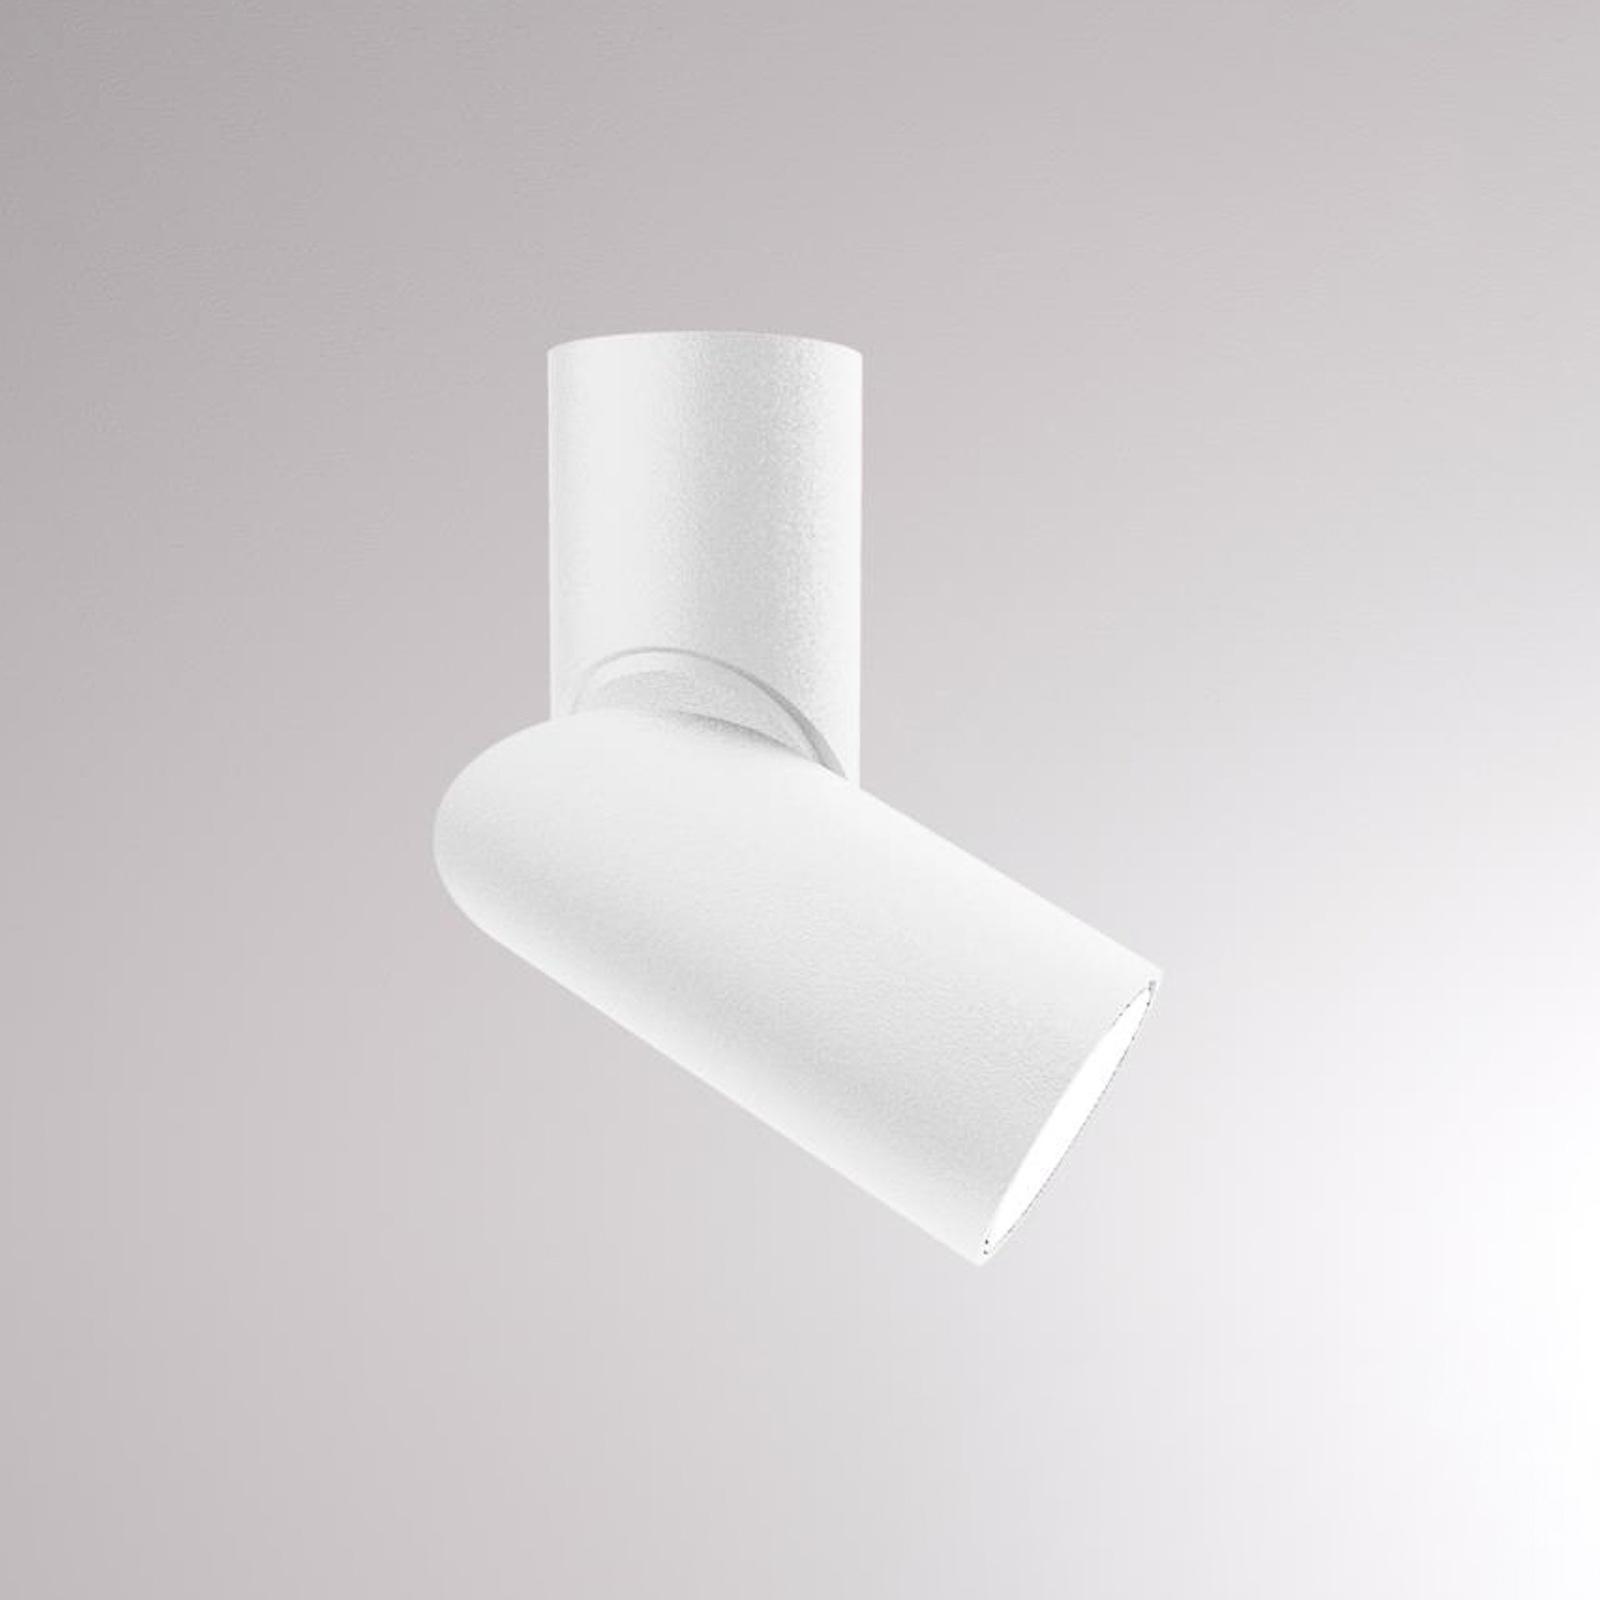 LOUM Turn 4 LED-Deckenspot weiß